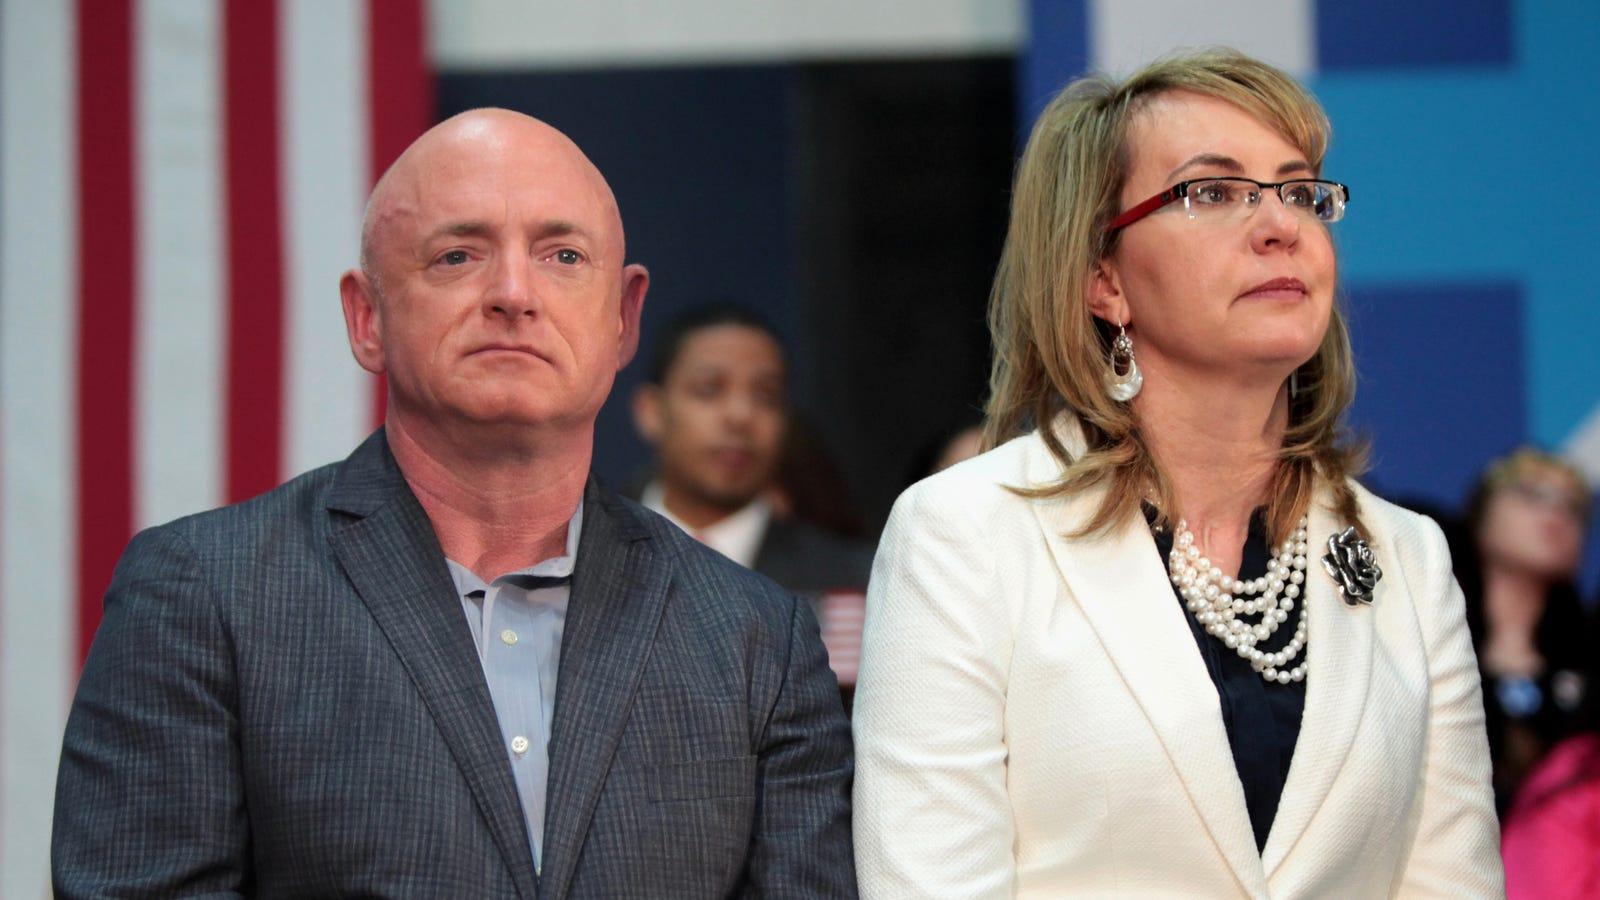 Mark Kelly, Retired Astronaut and Husband of Gabby Giffords, Announces Senate Bid